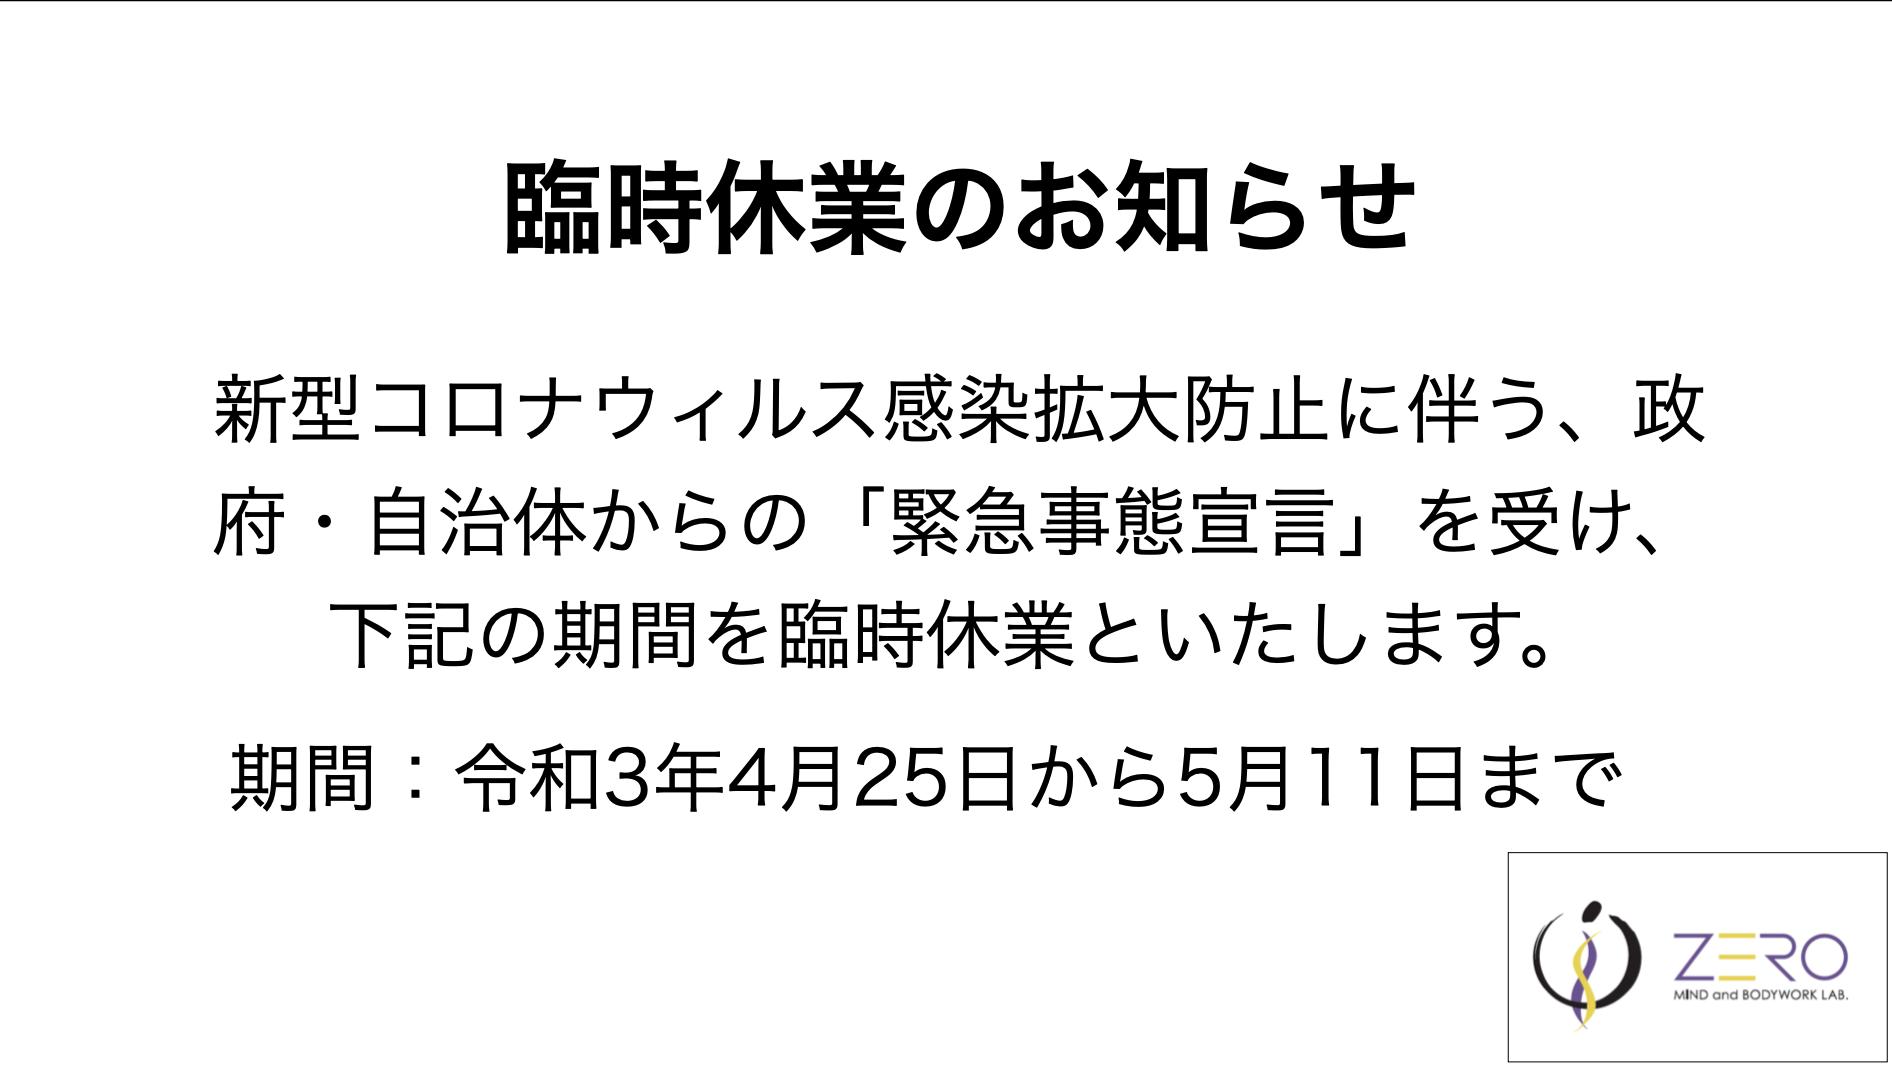 【R#217】新型コロナウイルス感染拡大防止のための休業のお知らせ